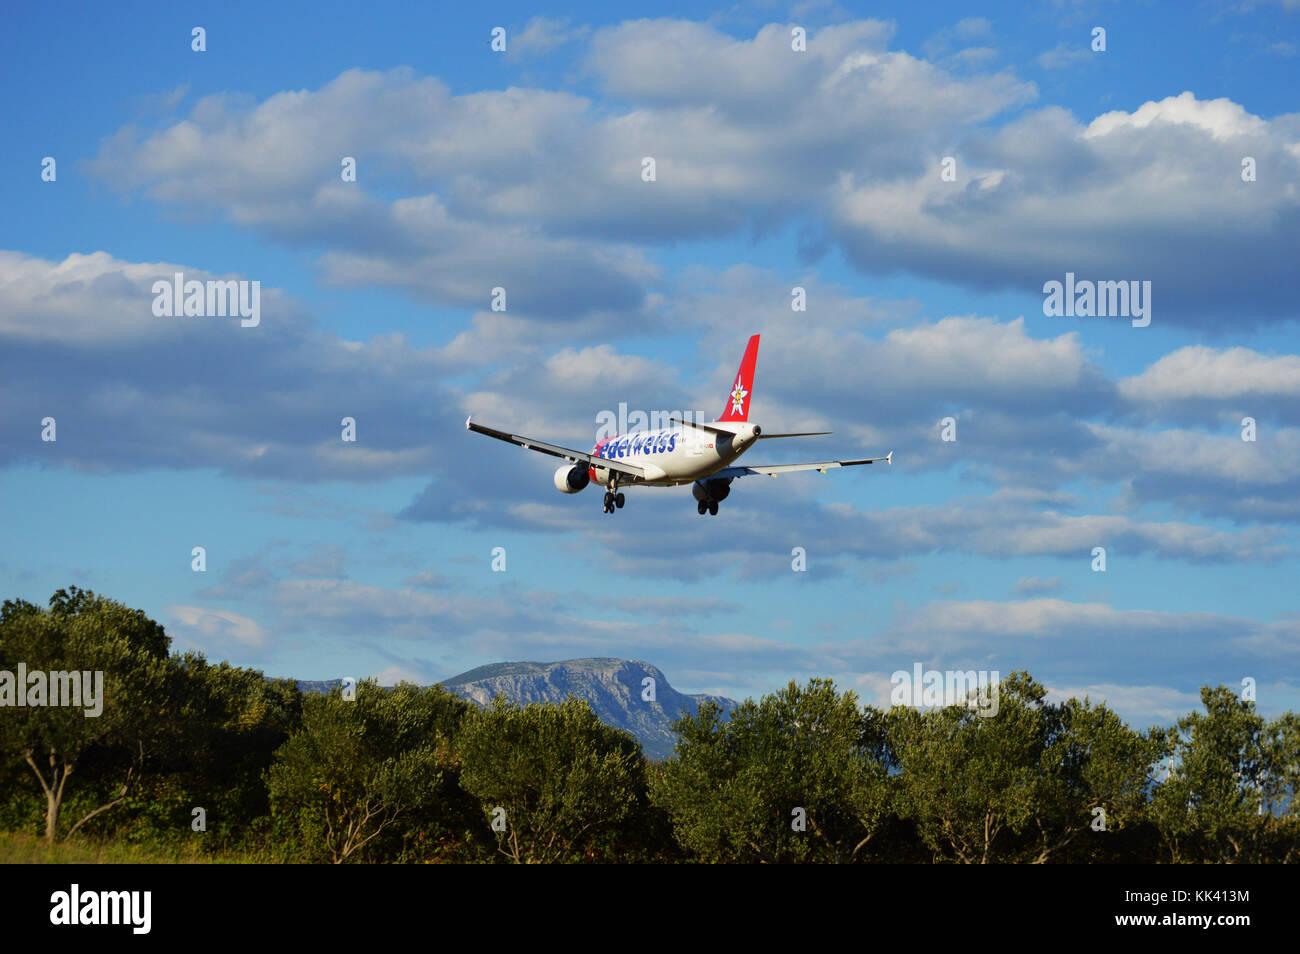 HB-IJV Edelweiss Airbus A320-214 landing on LDSP Split airport RWY 05, Kaštela Croatia - Stock Image